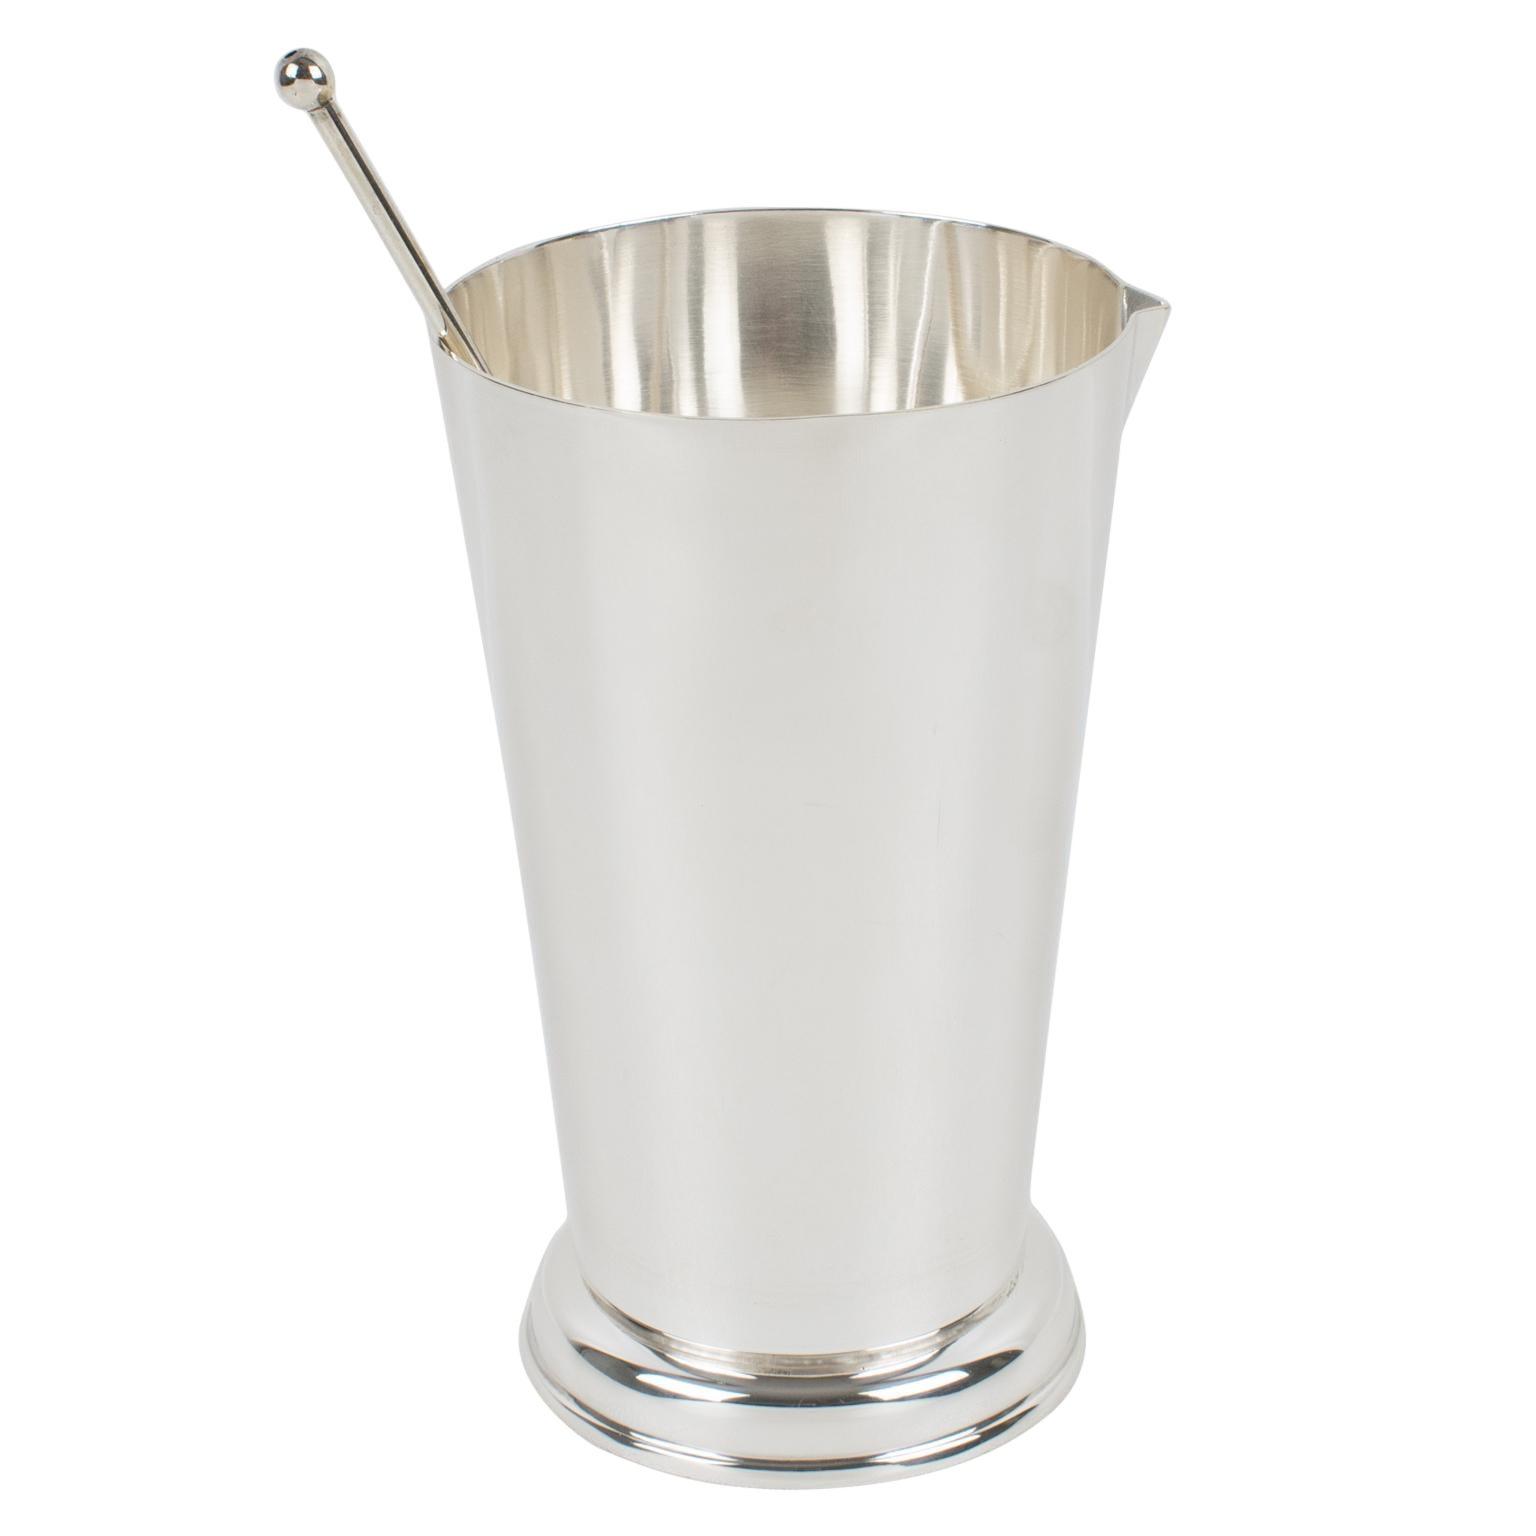 Art Deco Silver Plate Barware Cocktail Martini Pitcher by Produx Paris